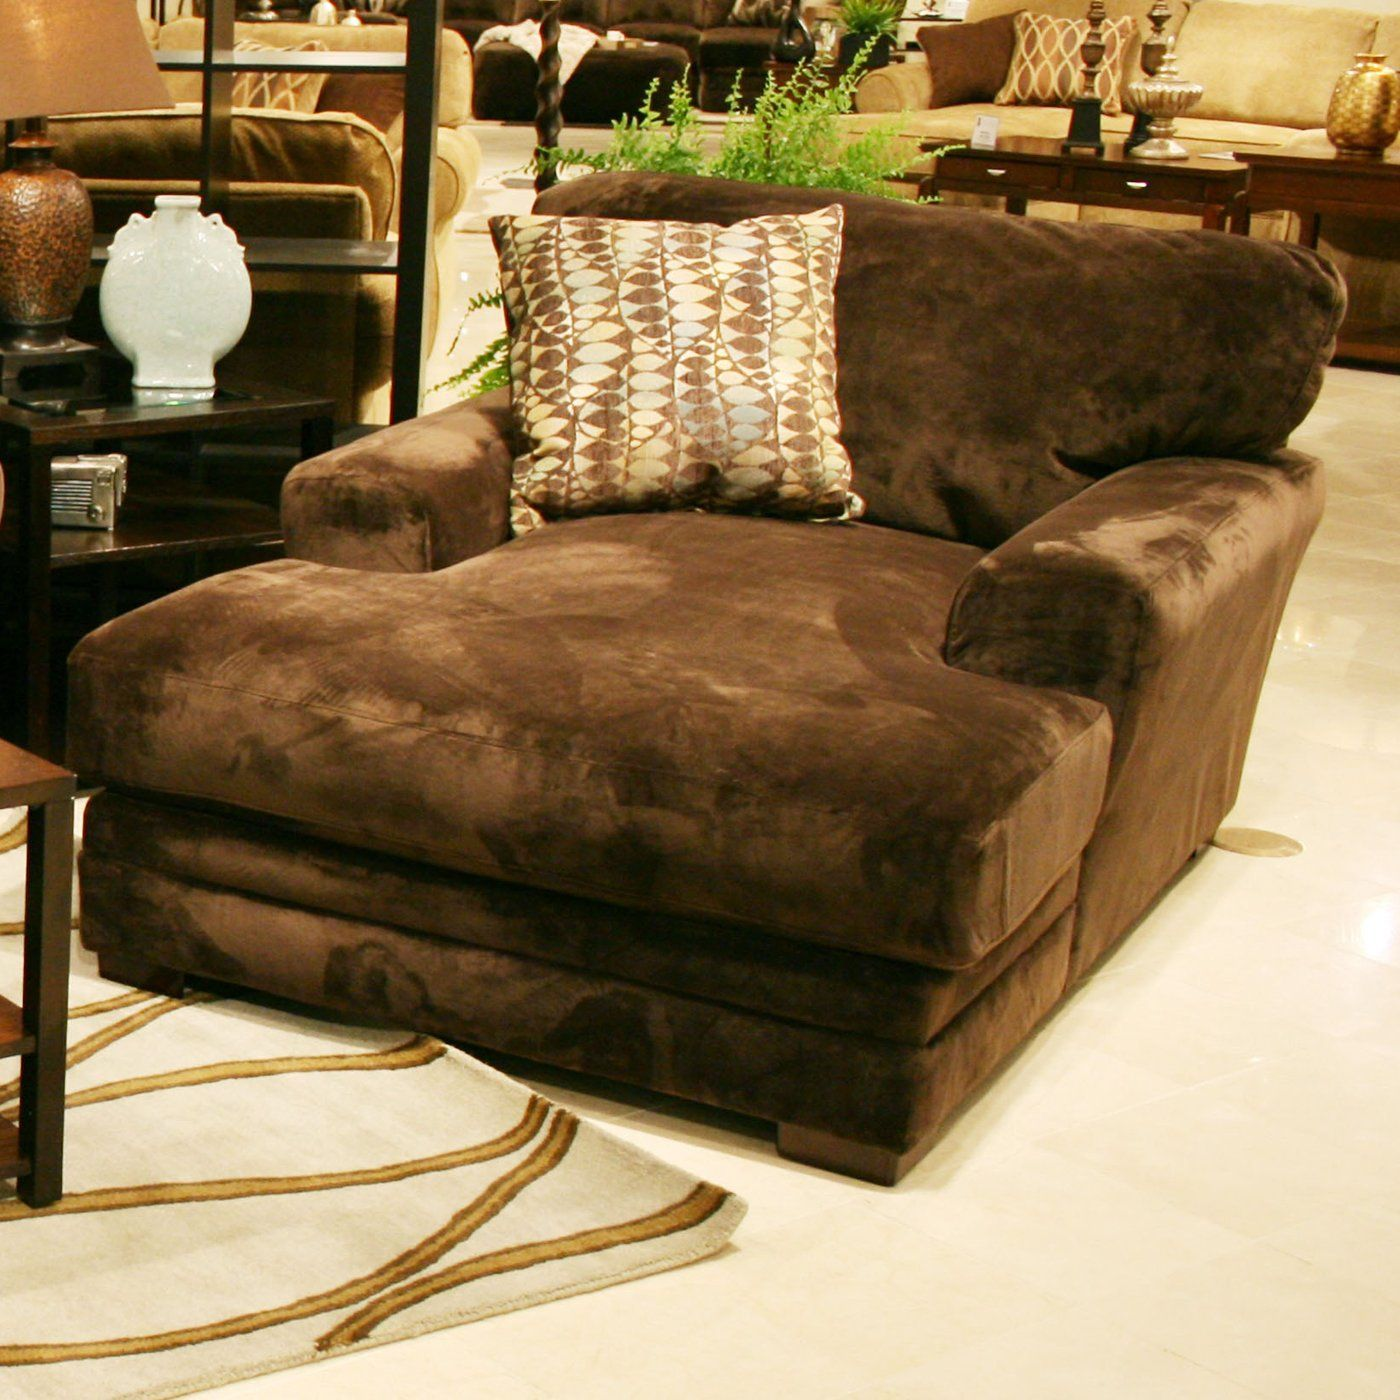 Jackson Furniture 4397 09 2831 08 Whitney Chaise Lounge